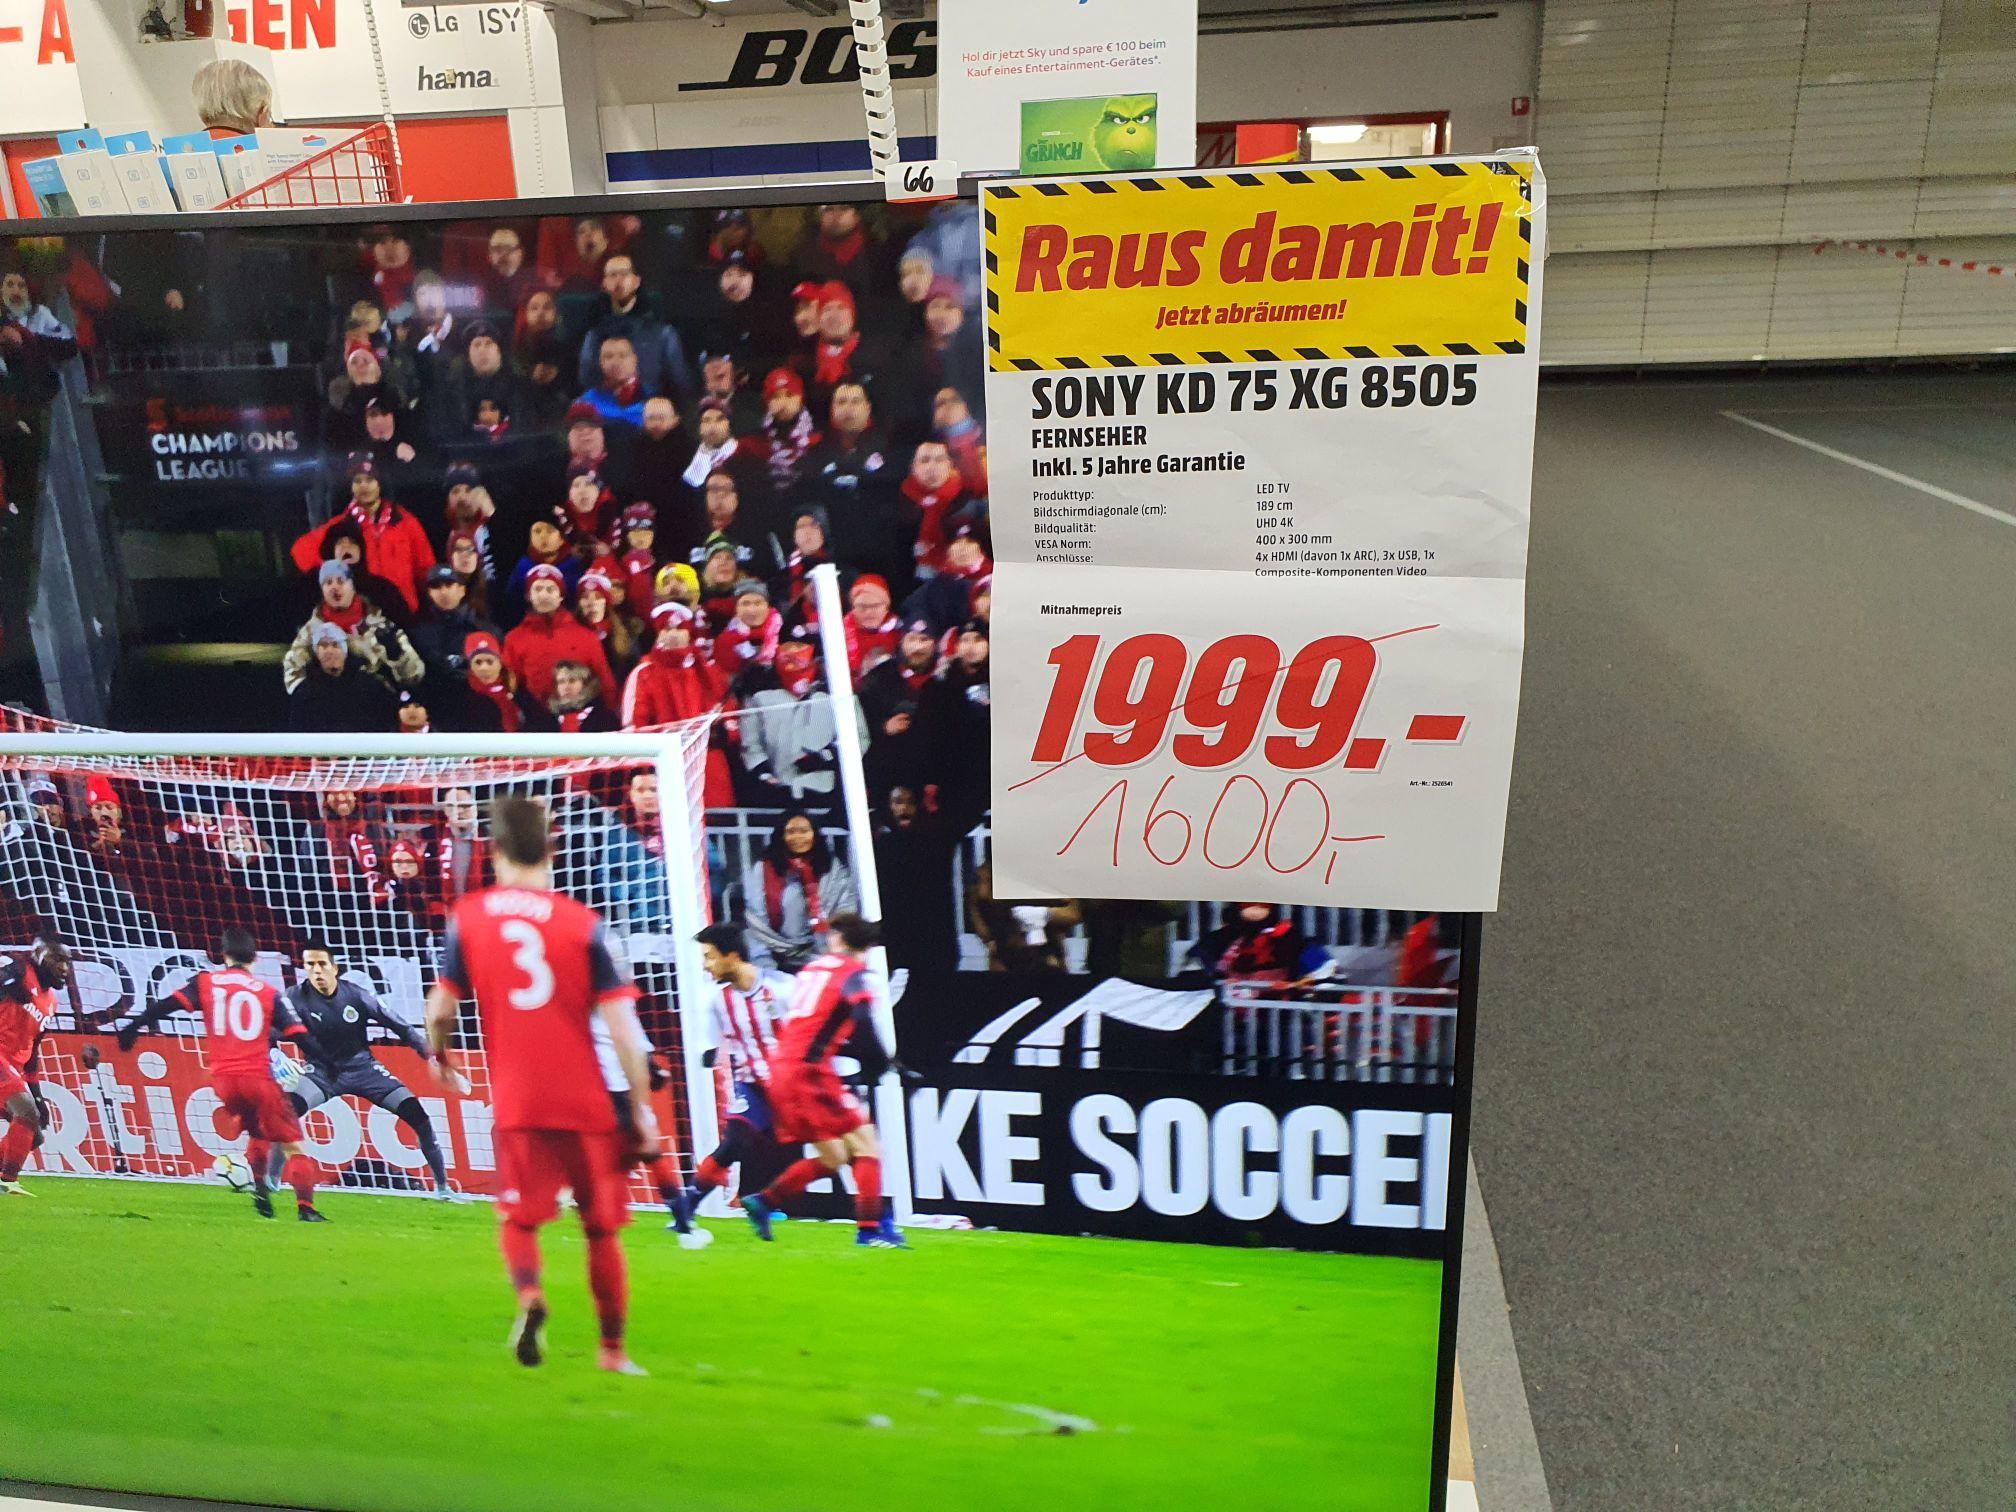 [Lokal Media Markt Hamburg Nedderfeld] Sony KD 75 XG8505 Smart TV für 1400€ inkl. 5 Jahre Garantie